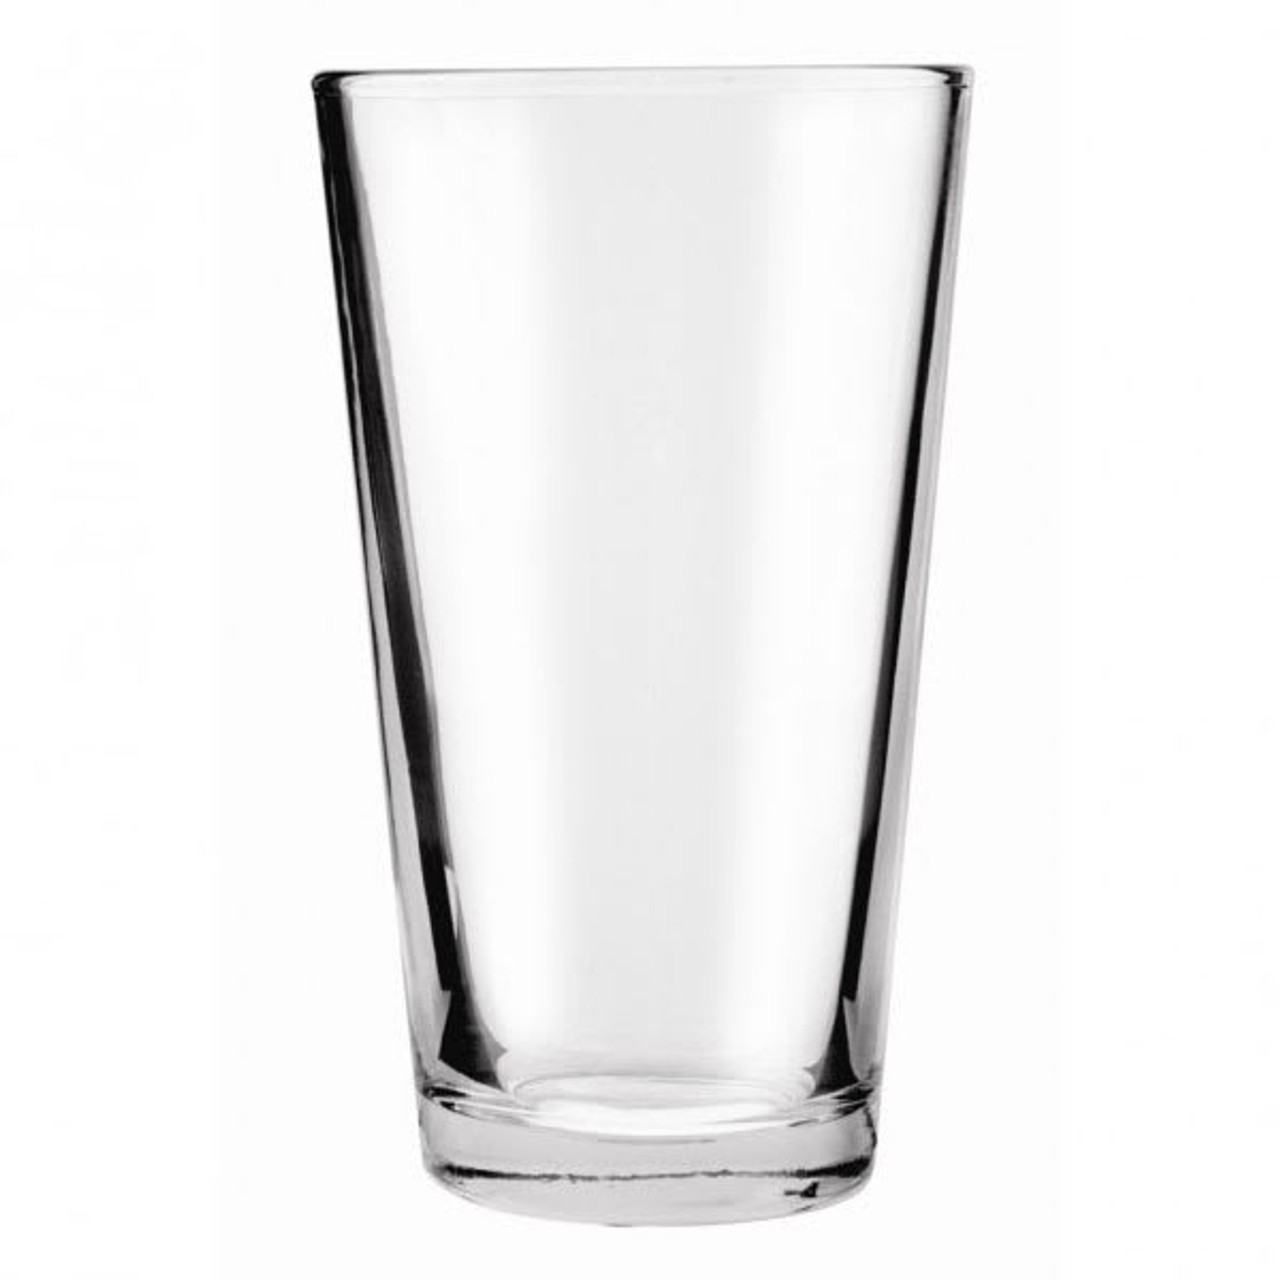 Anchor 176FU 16 oz Mixing Glass